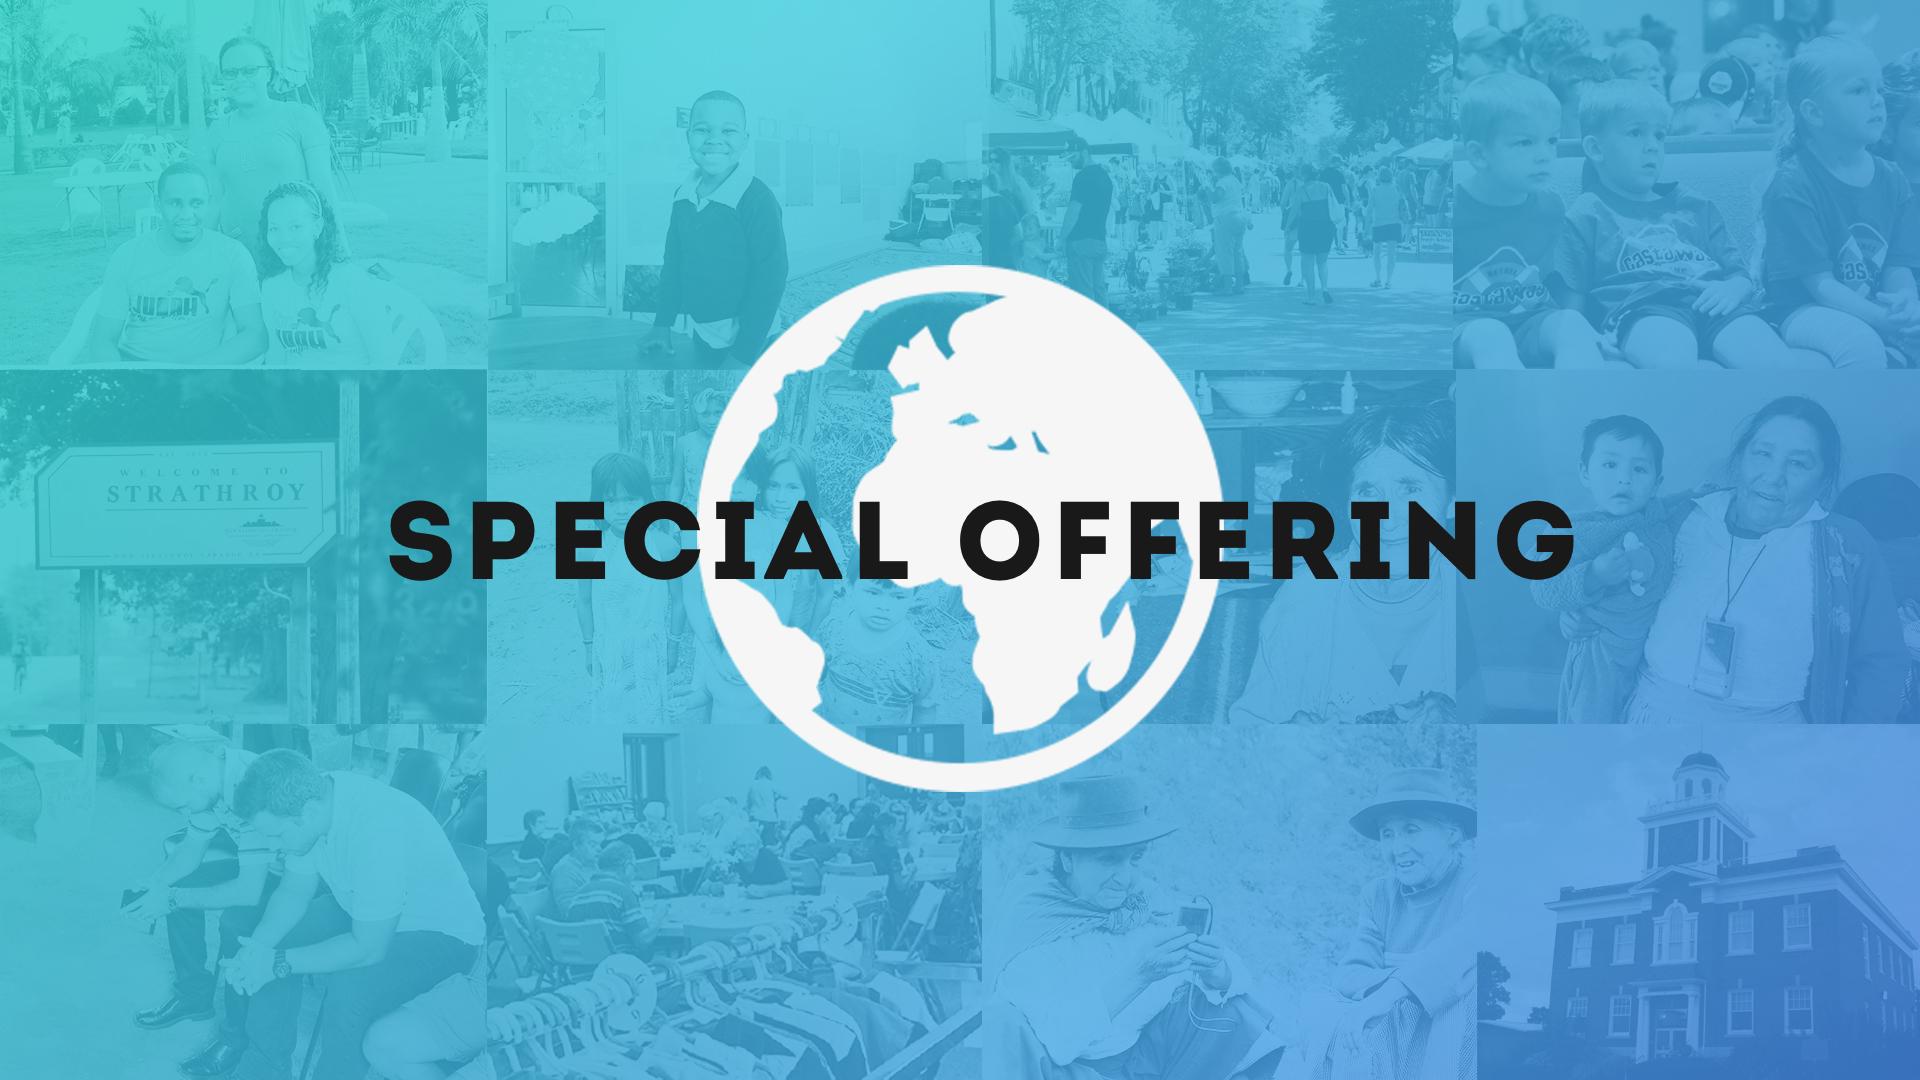 Special Offering 1920x1080.jpg